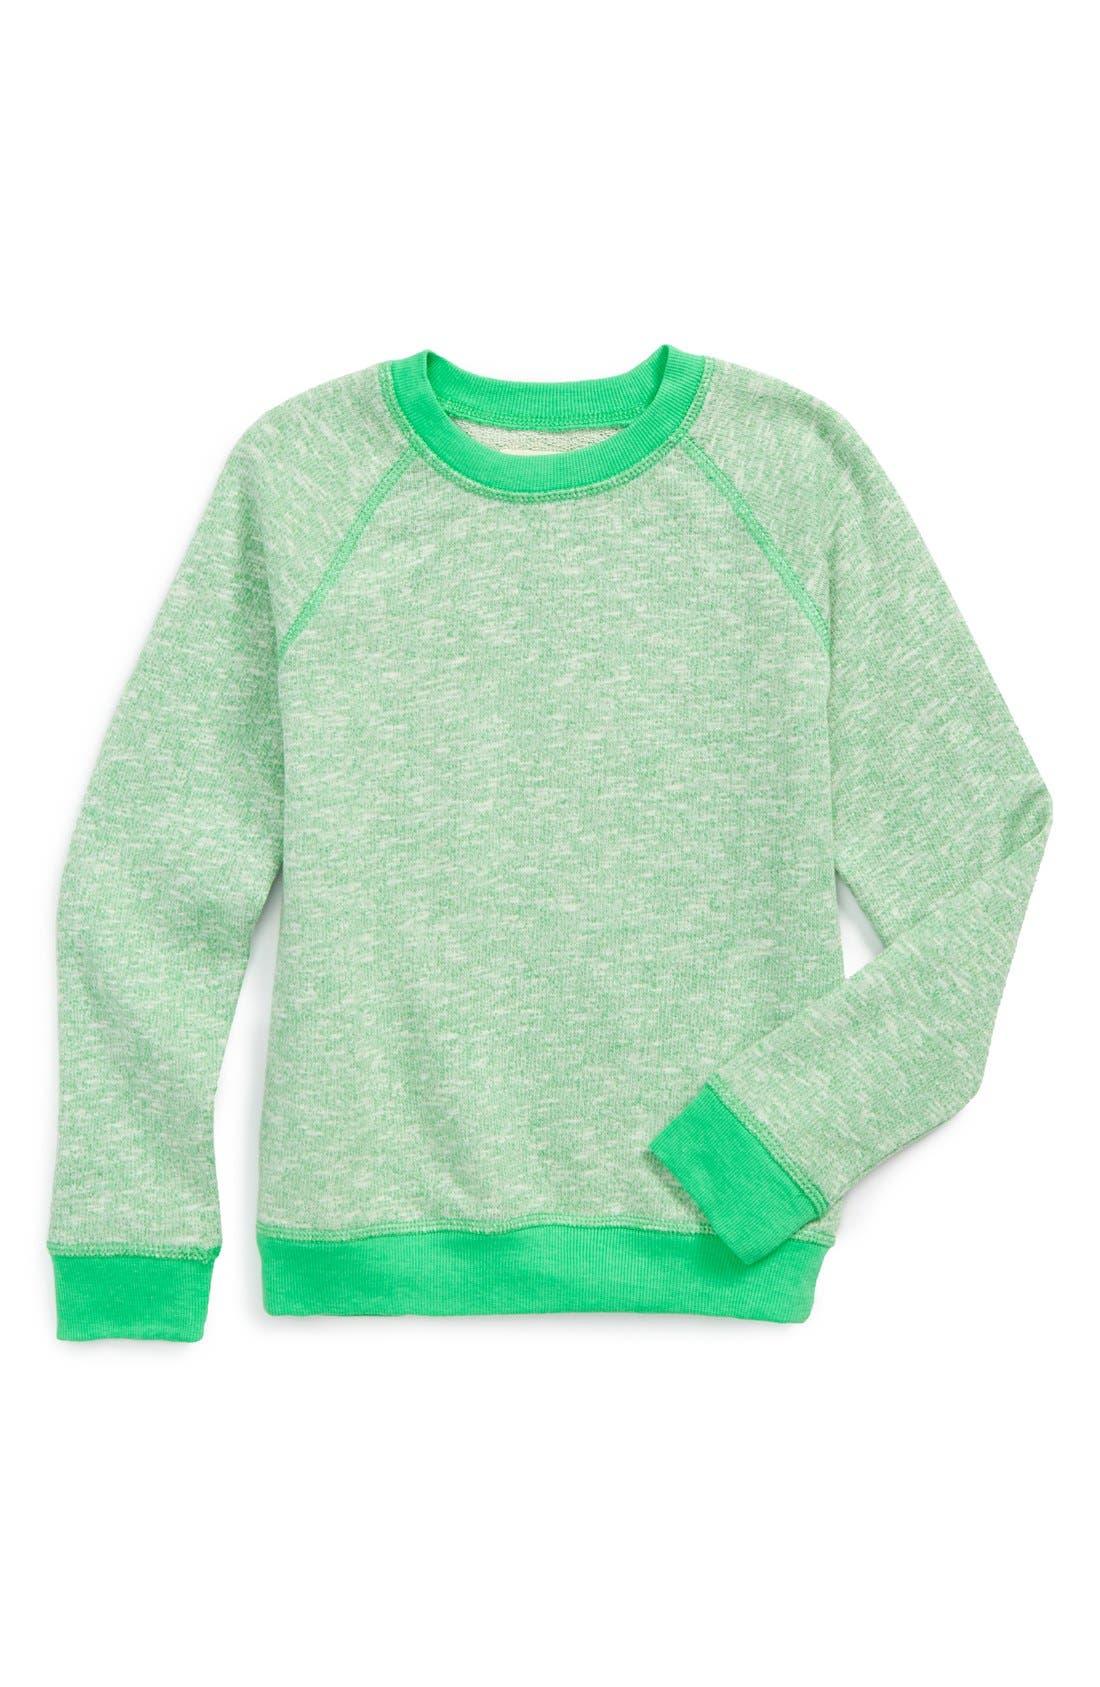 Space Dye Fleece Sweatshirt,                         Main,                         color, 330